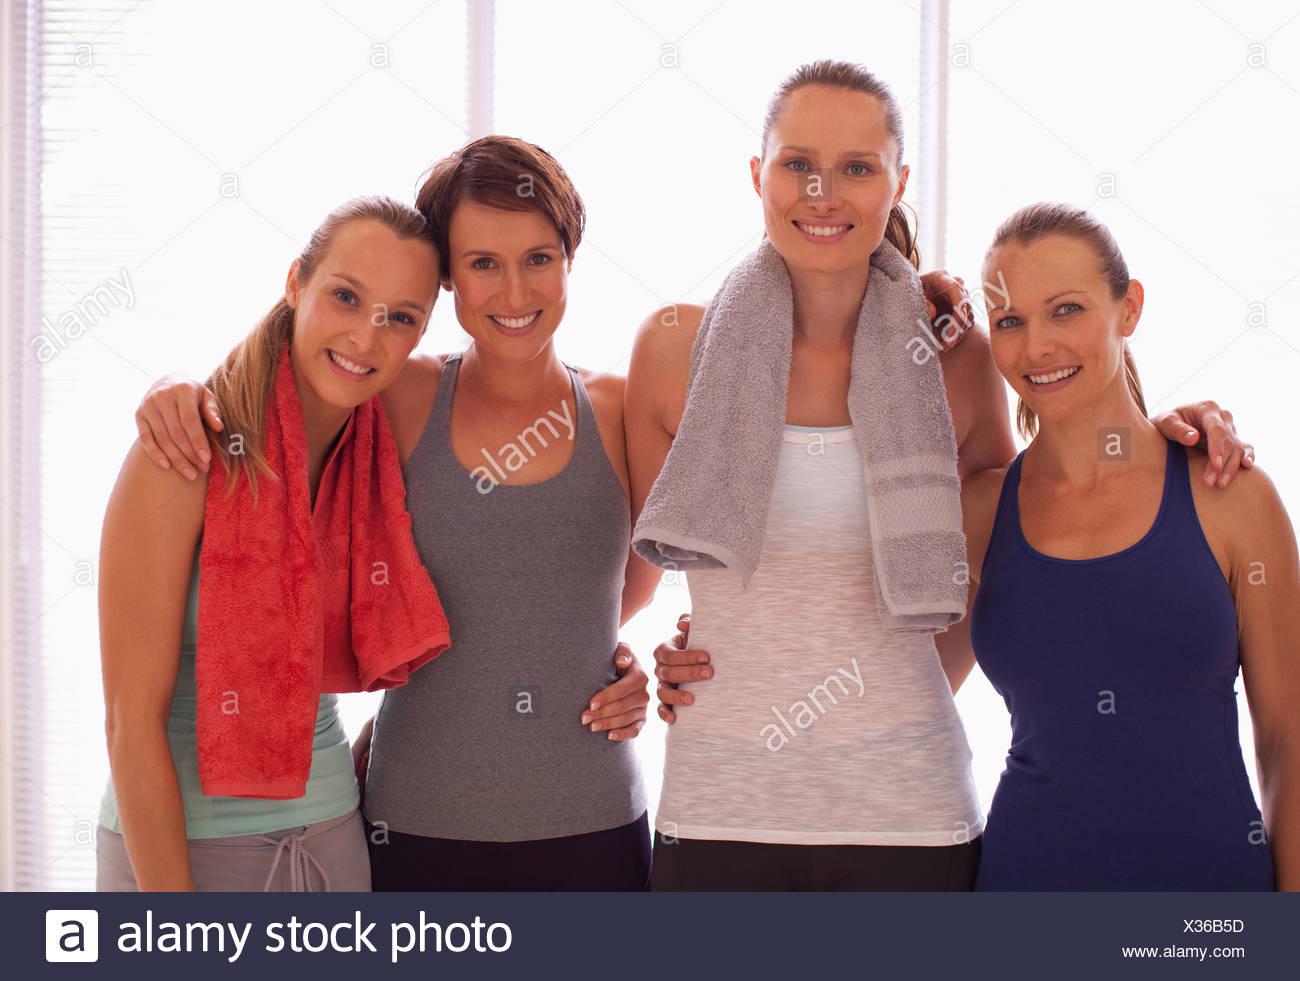 Portrait of smiling women holding yoga mats - Stock Image